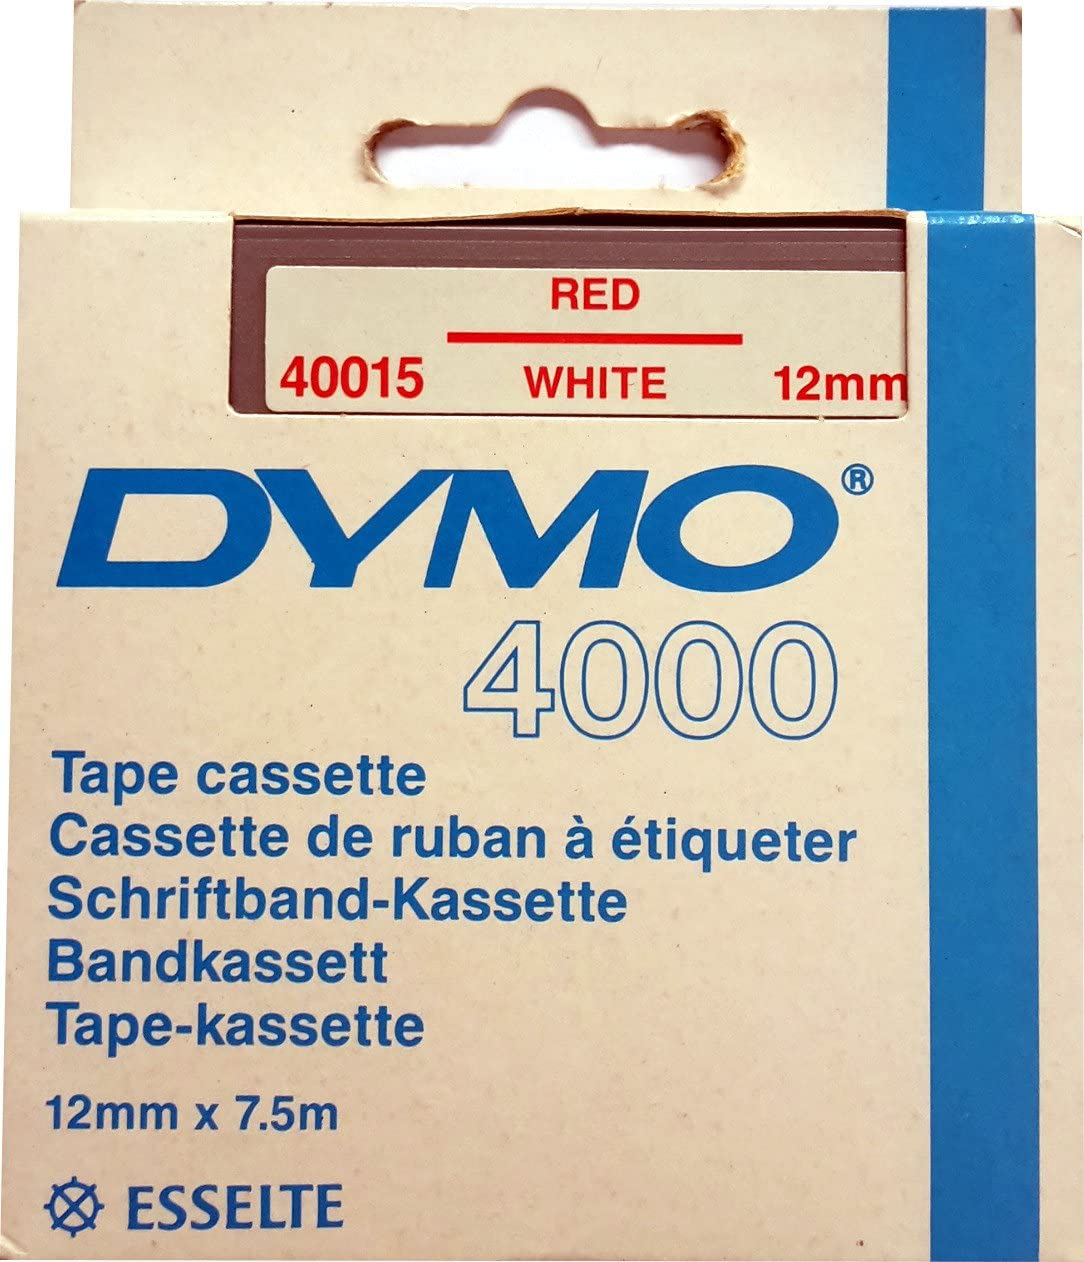 12mm x 7,5m f/ür DYMO 4000 Dymo Schriftband-Kassette 40015 rot auf wei/ß